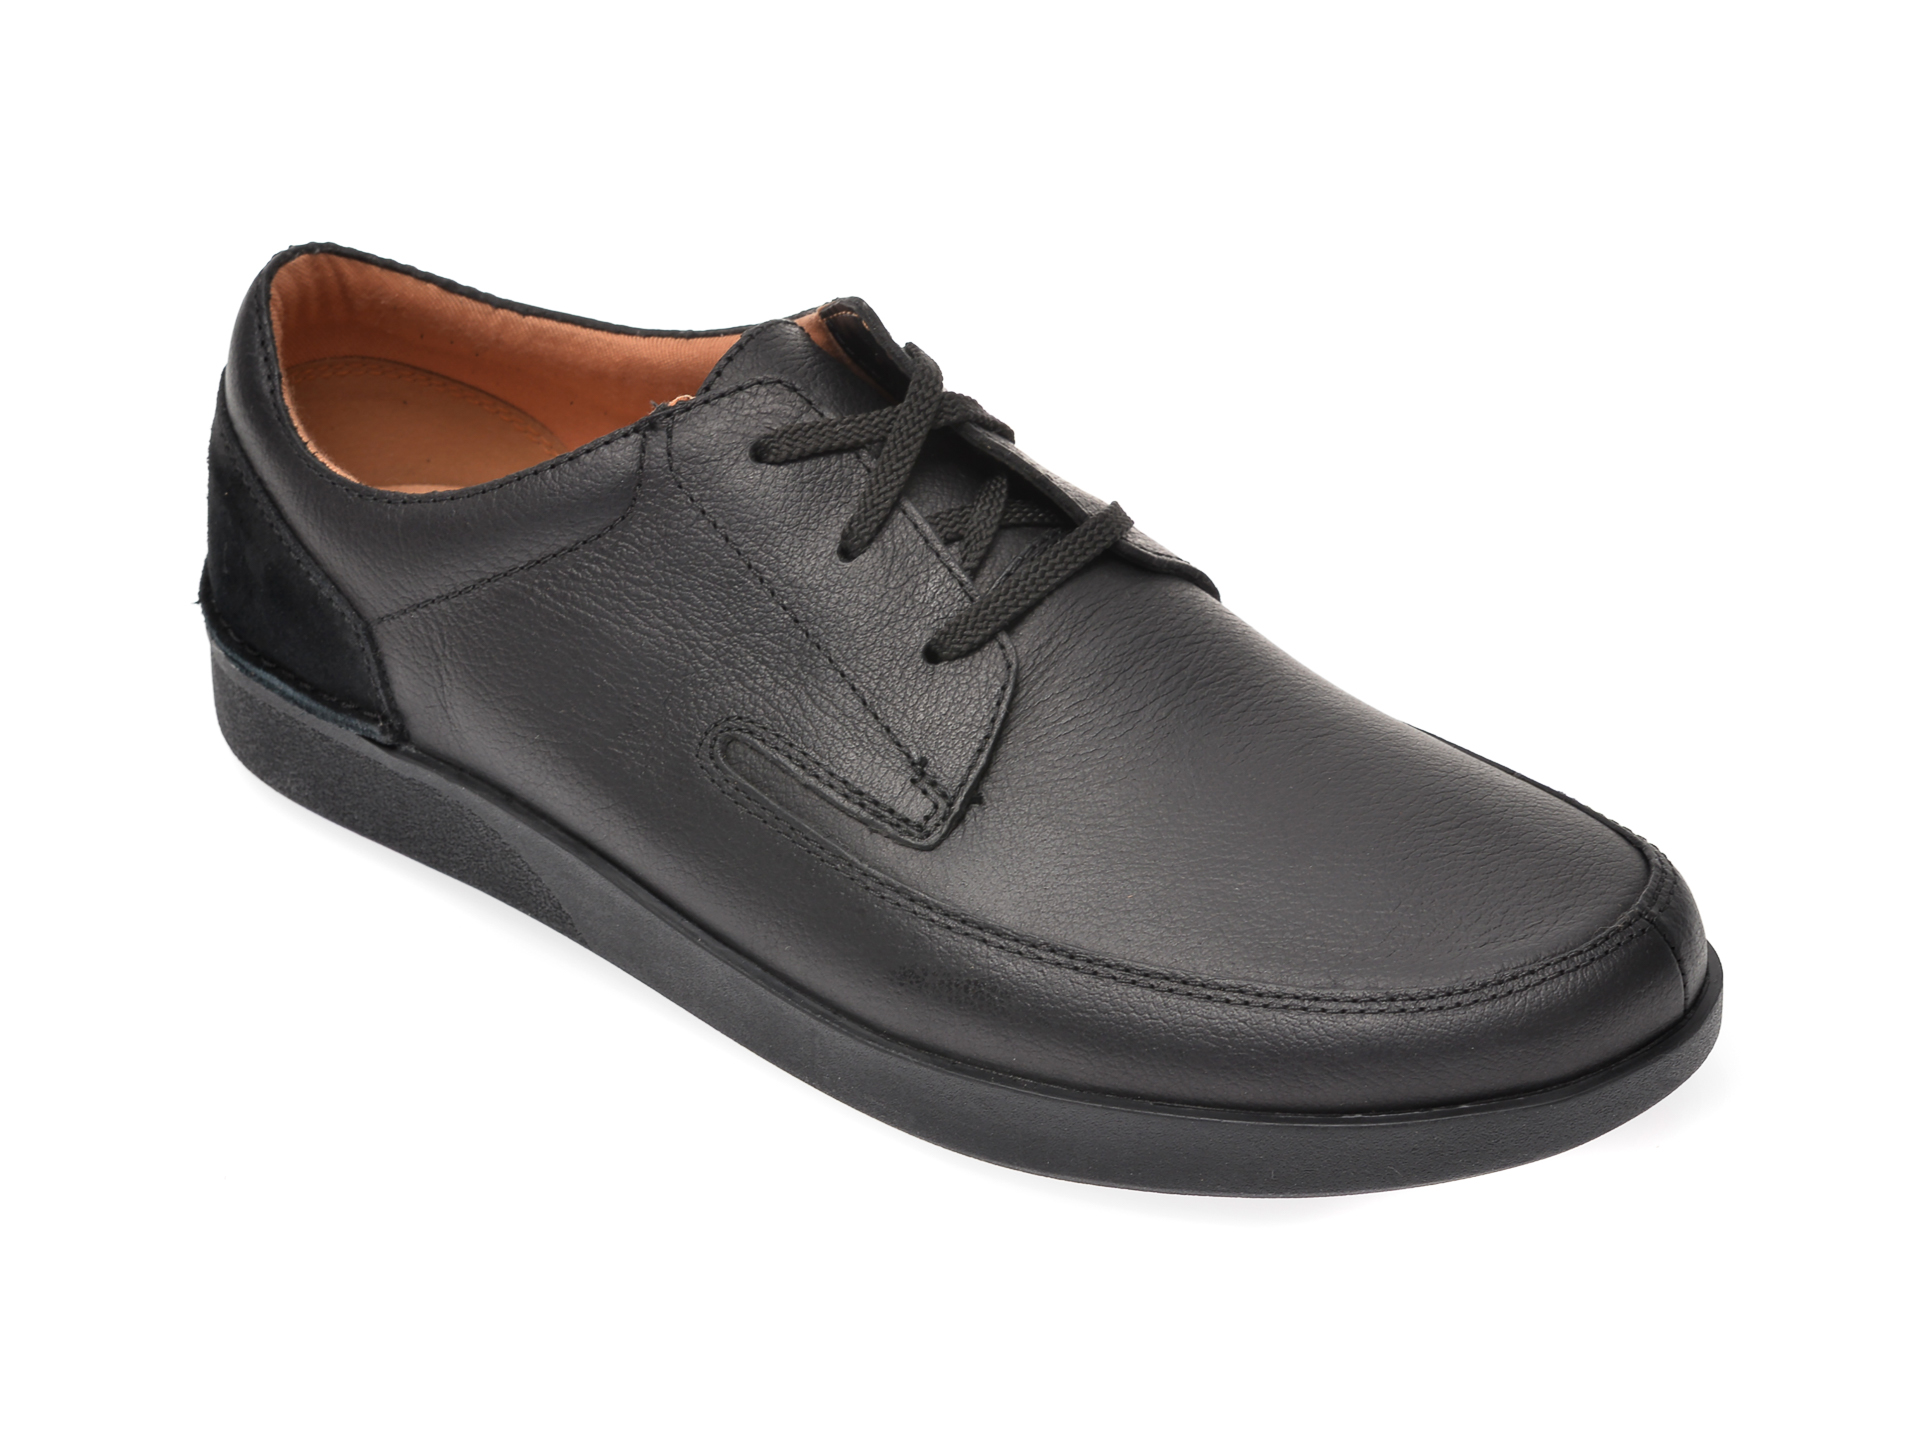 Pantofi CLARKS negri, Oakland Craft, din piele naturala imagine